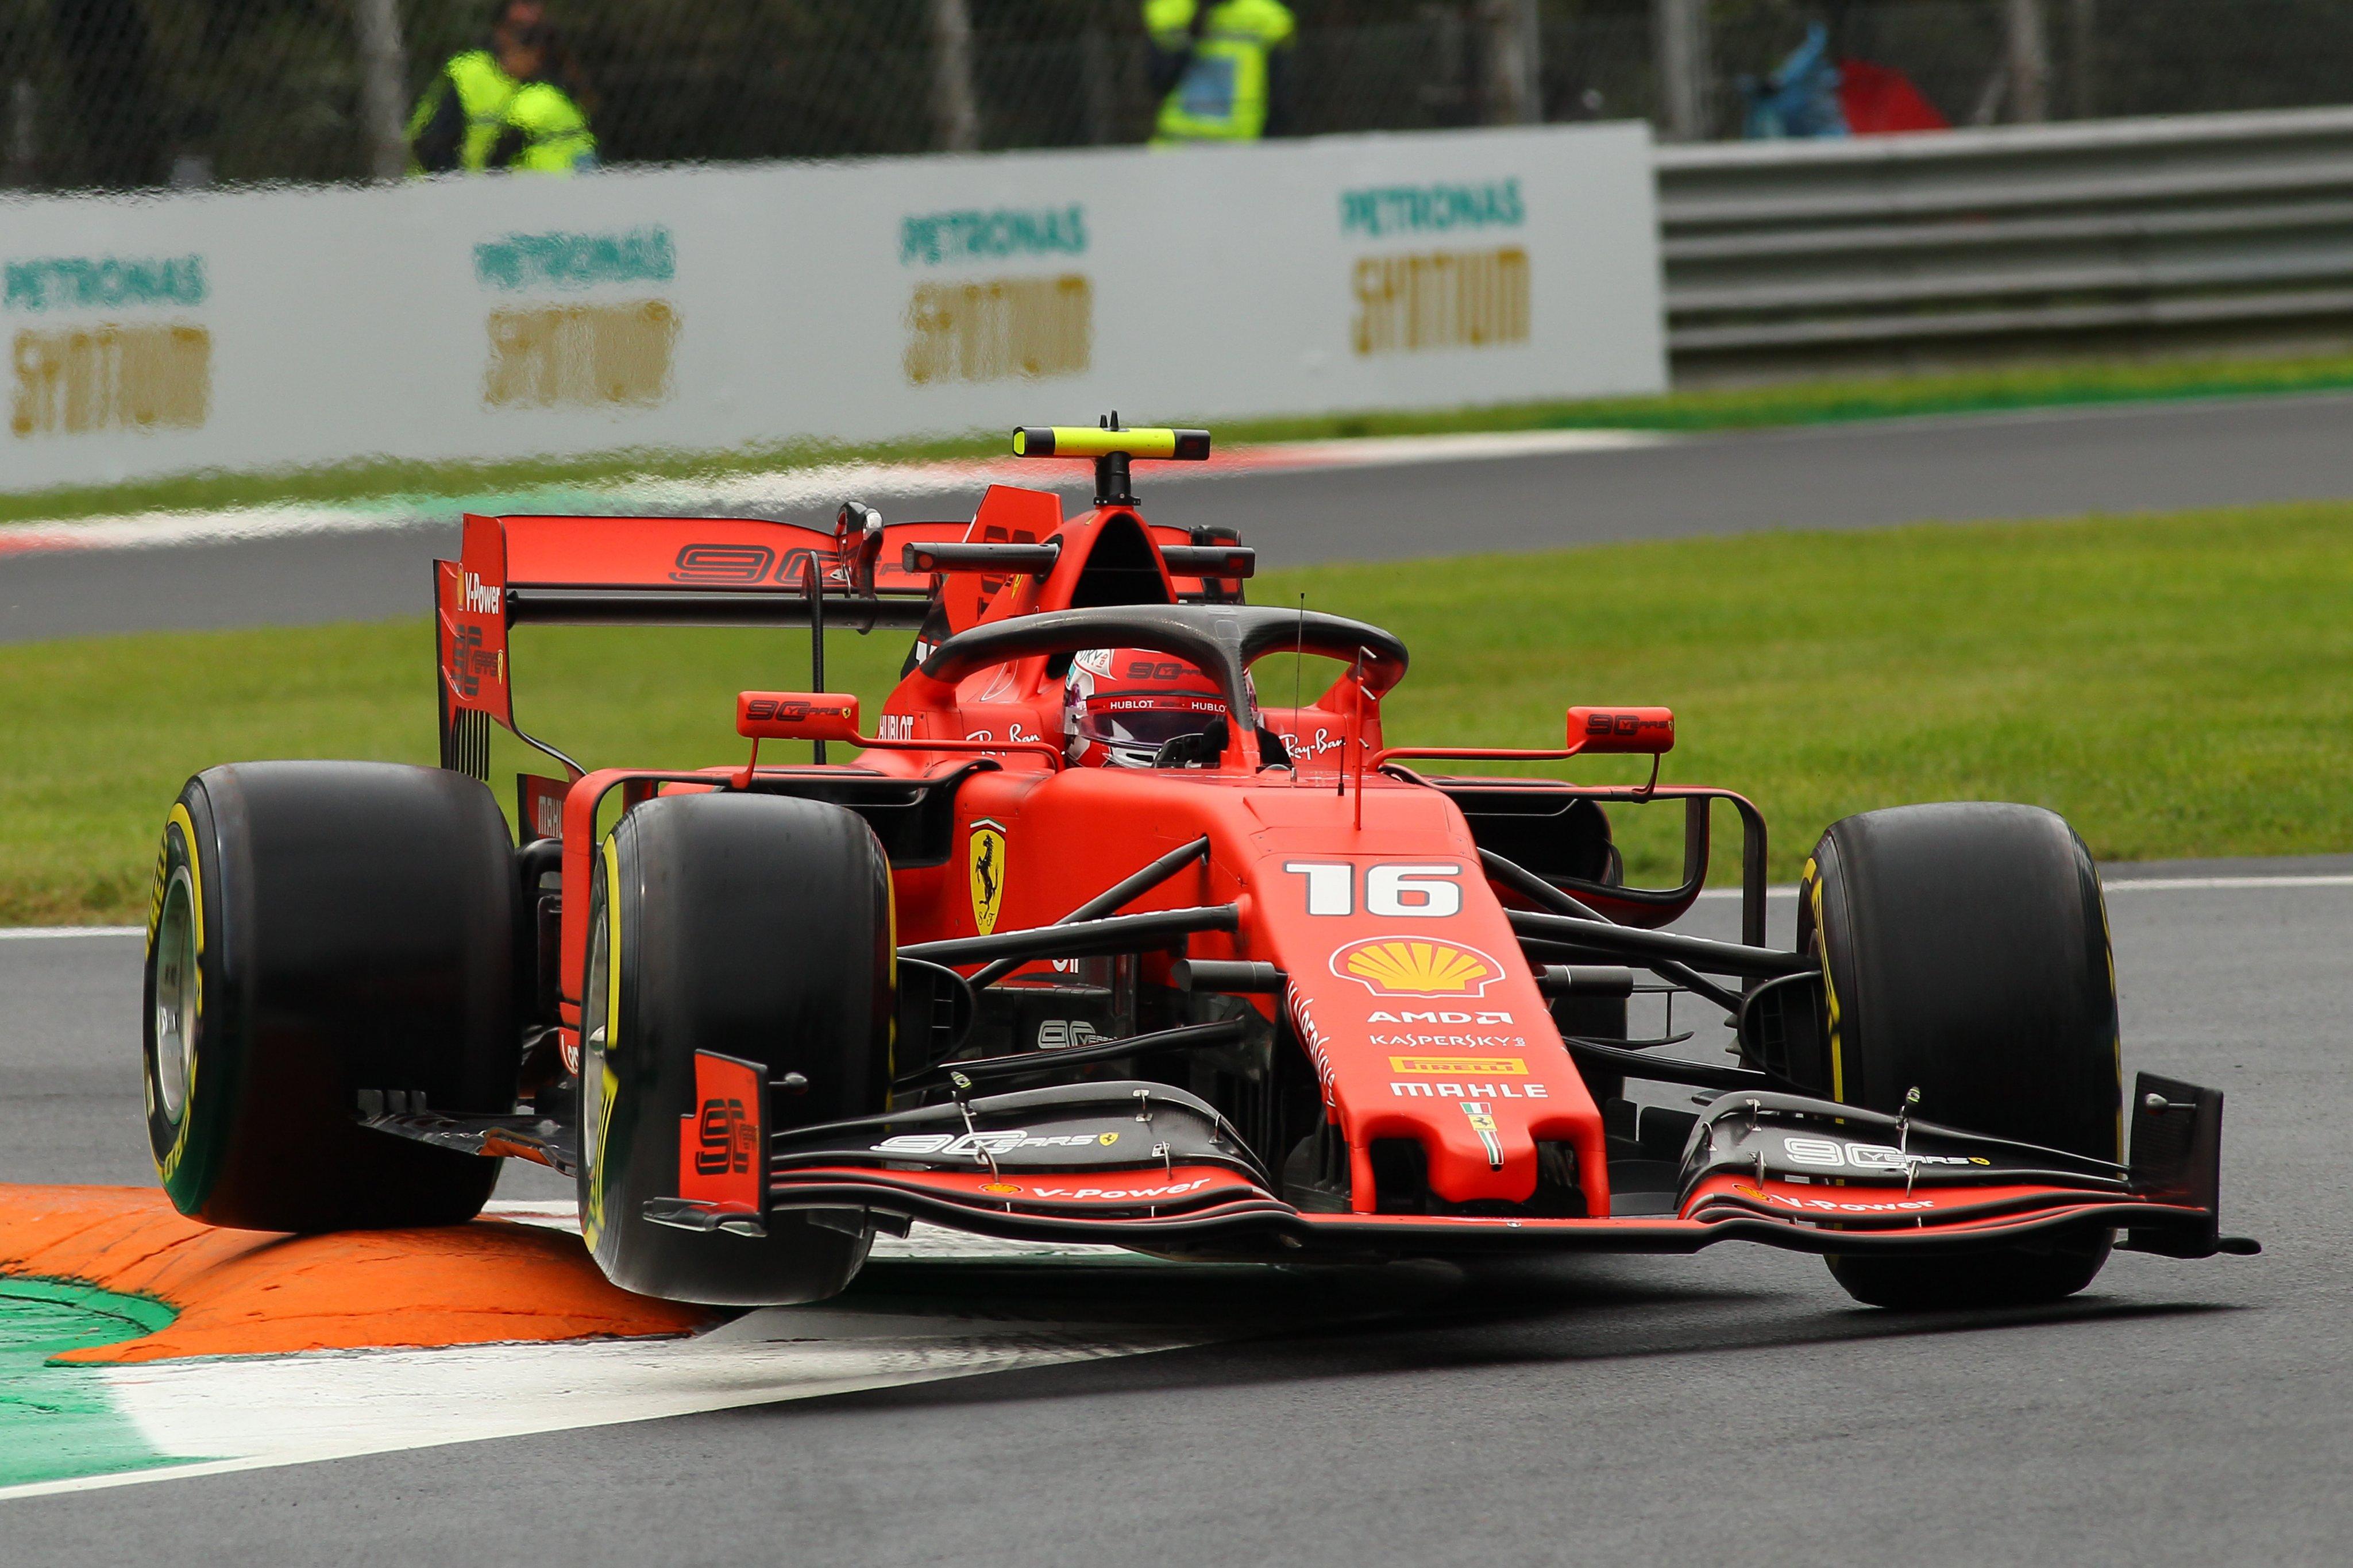 GP Italie - EL2 : Leclerc 68 millièmes devant Hamilton 1